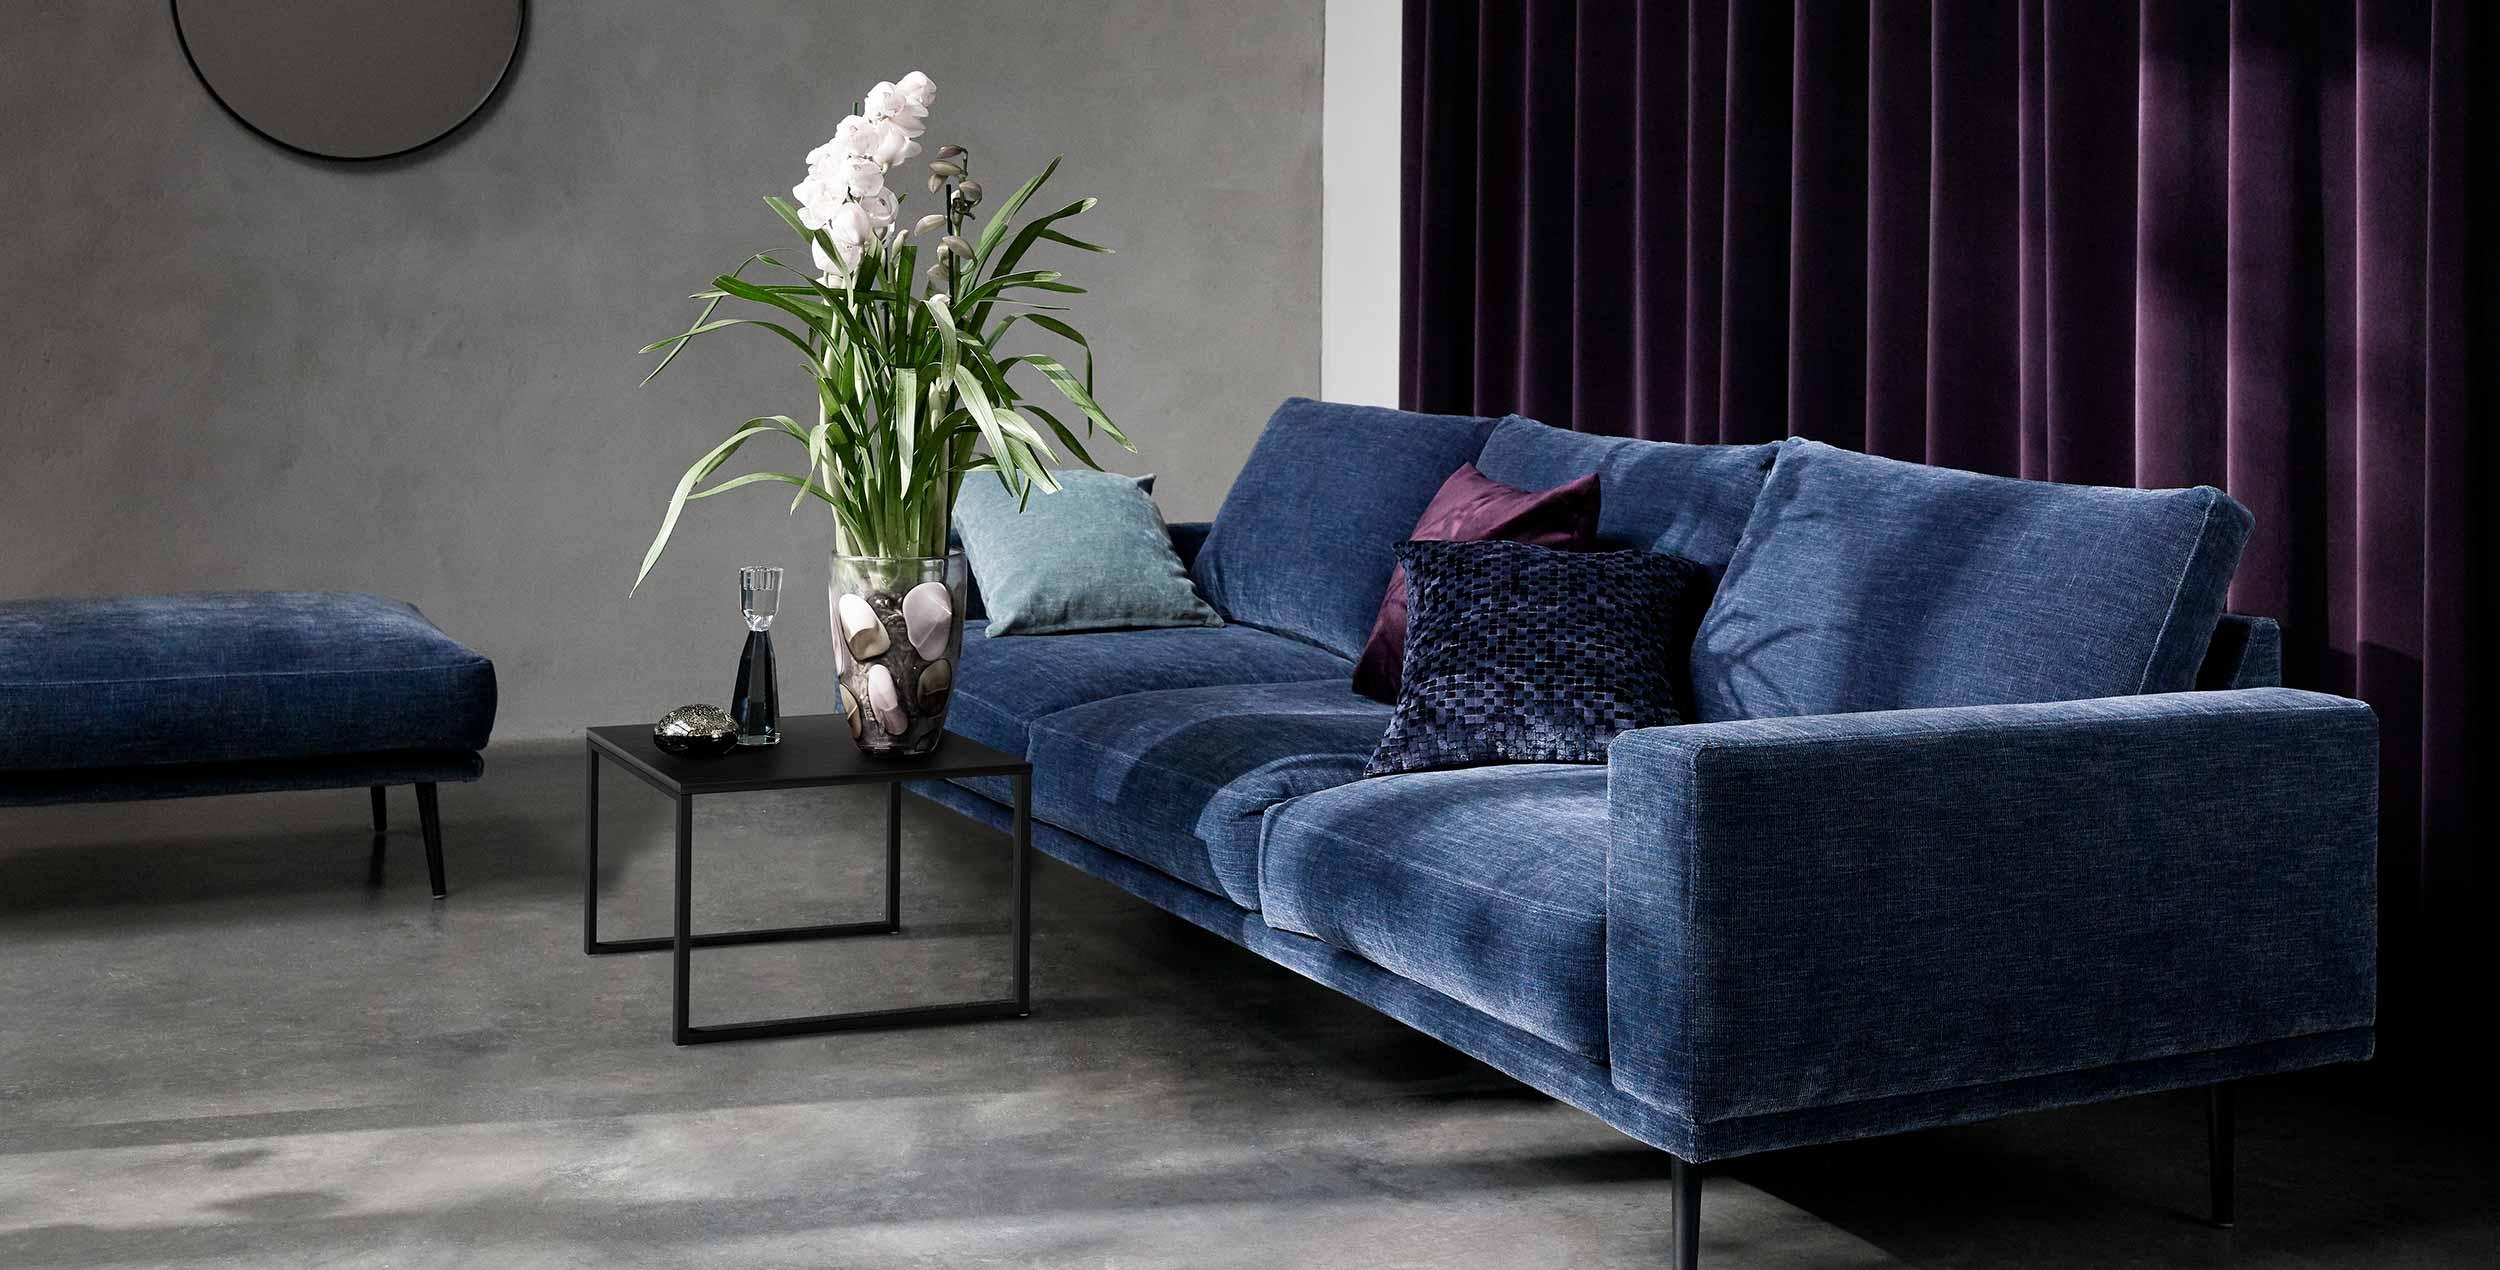 Coastal blue sofa in living room